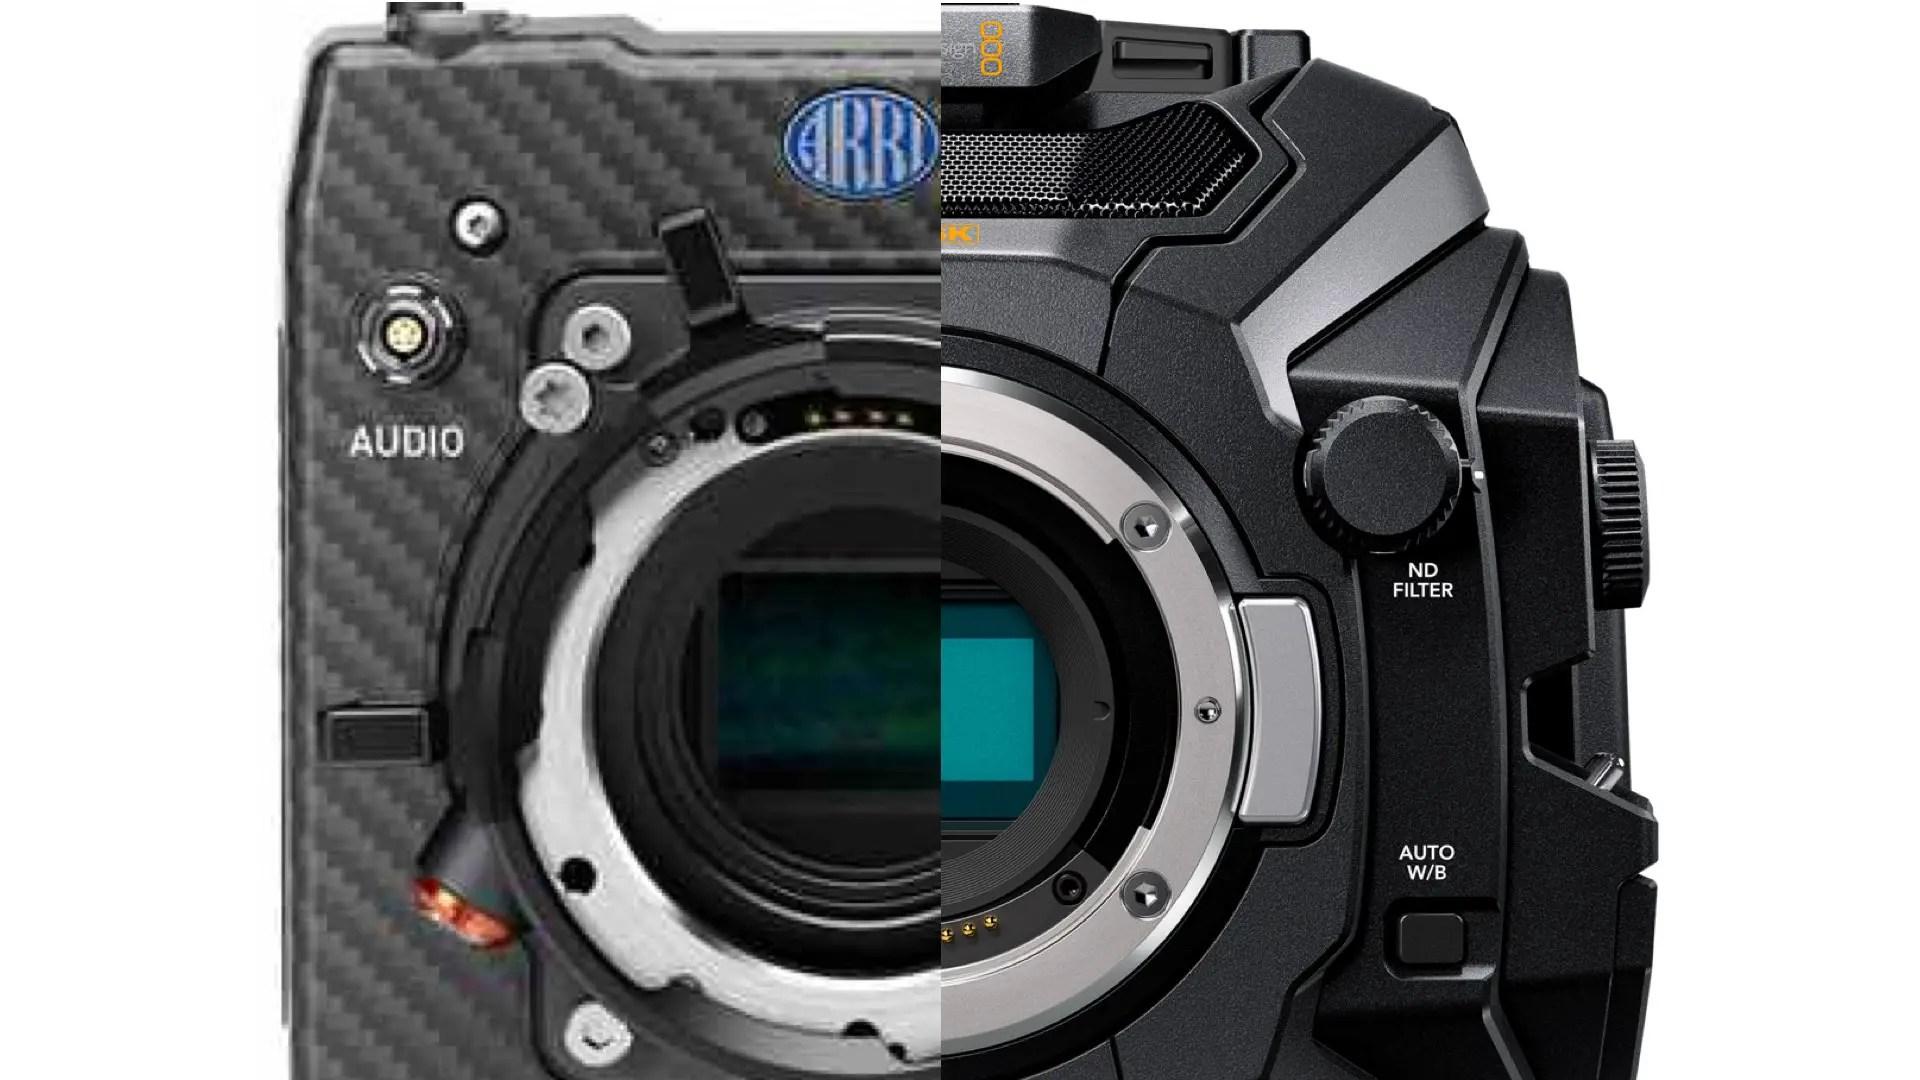 Blackmagic URSA Mini Pro and ARRI ALEXA Mini: The Optimal On